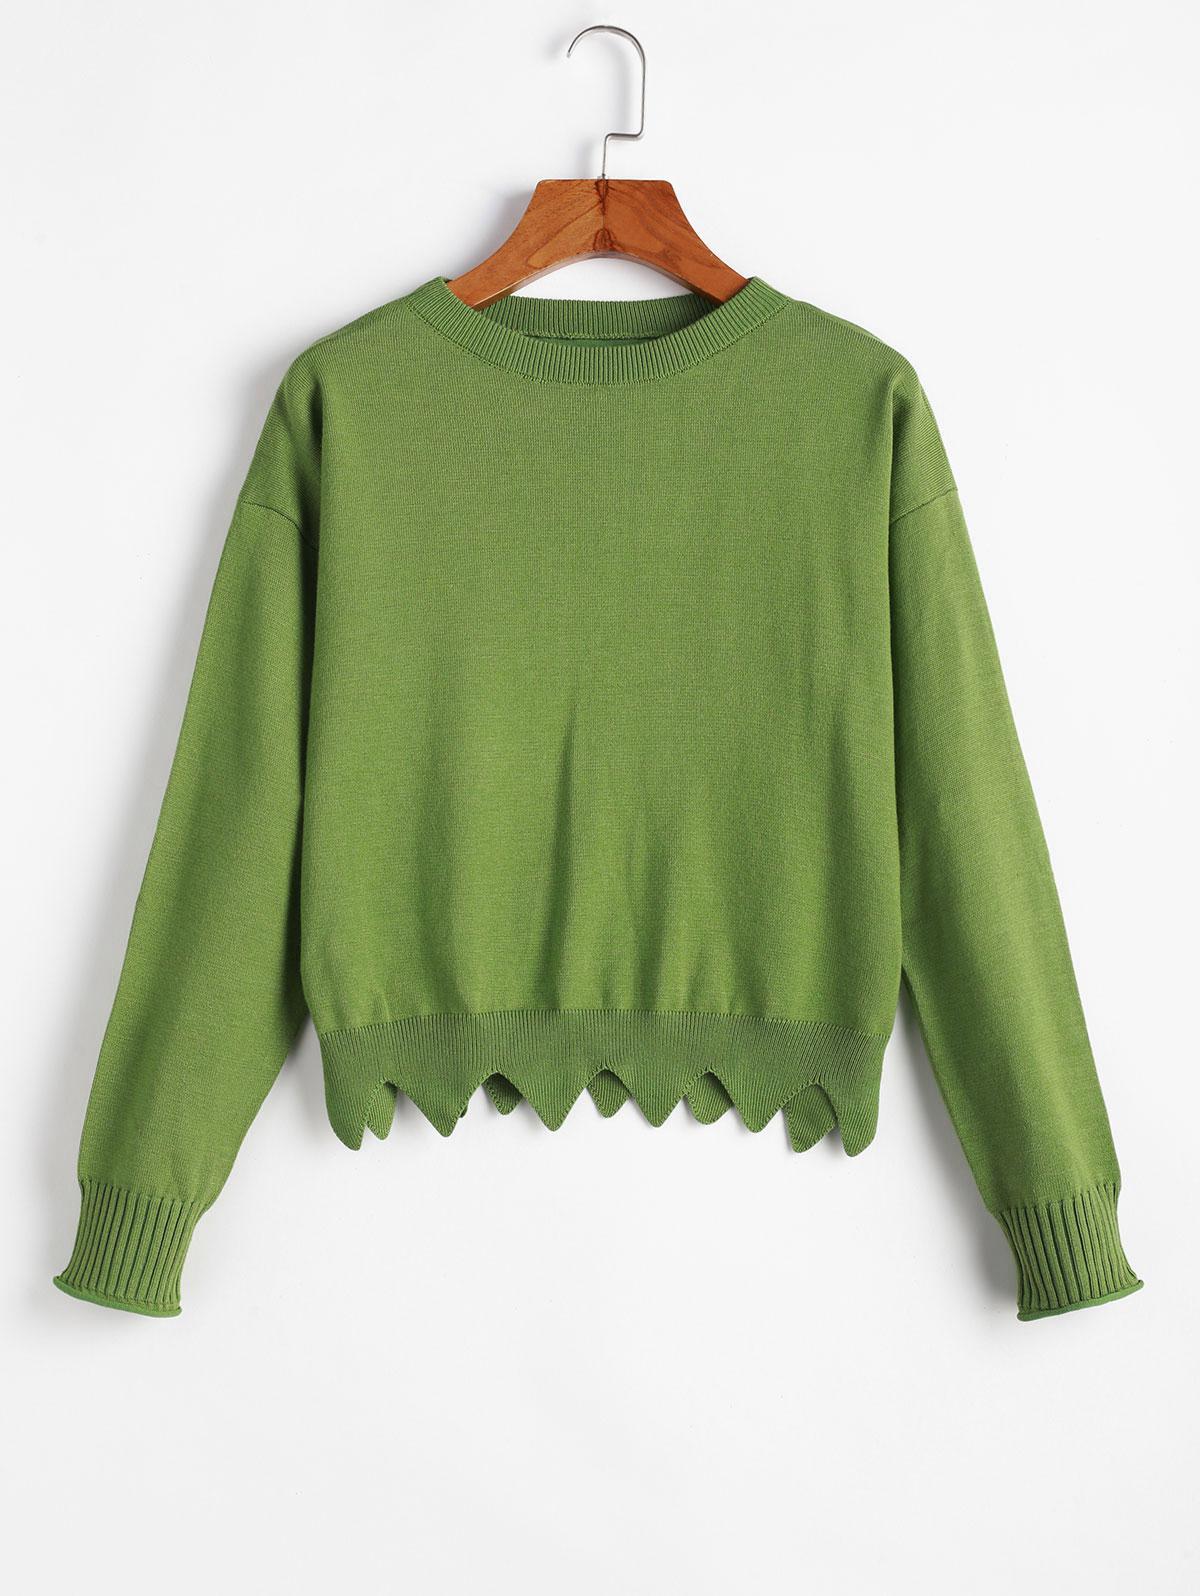 Crew Neck Zig Zag Hem Pullover Sweater